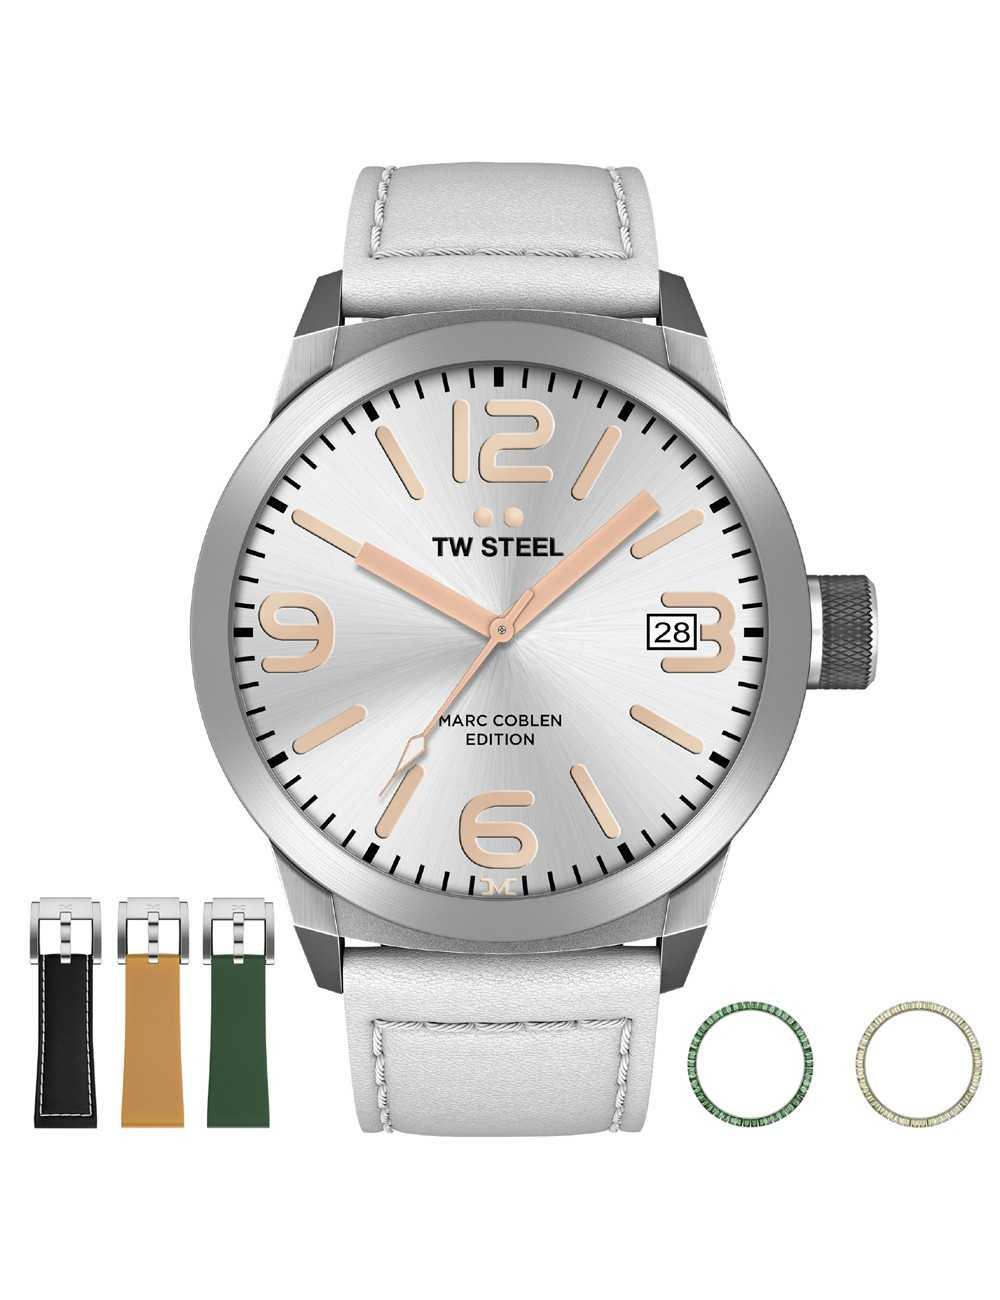 Pánske hodinky TW Steel Marc Coblen Edition TWMC21